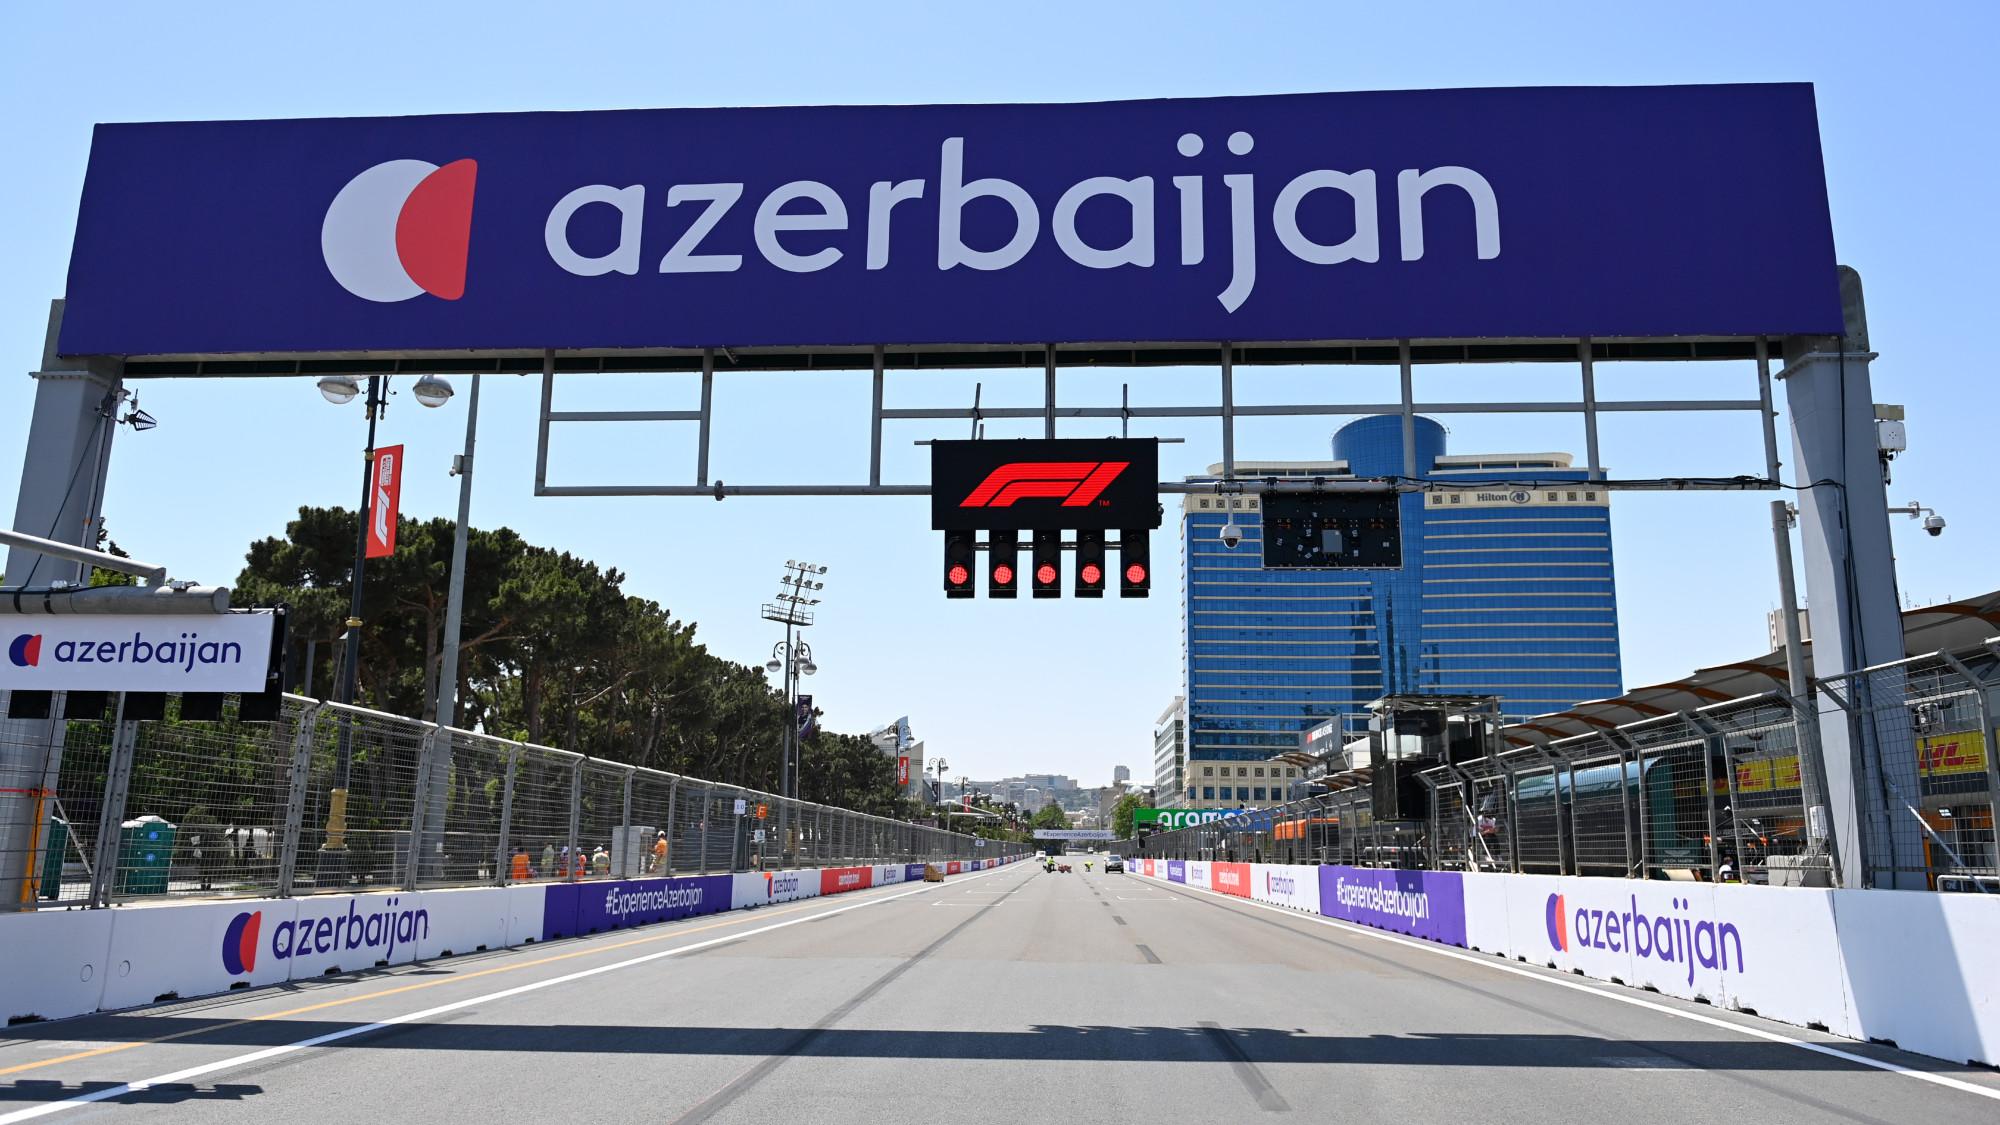 Azerbaijan GP 2021